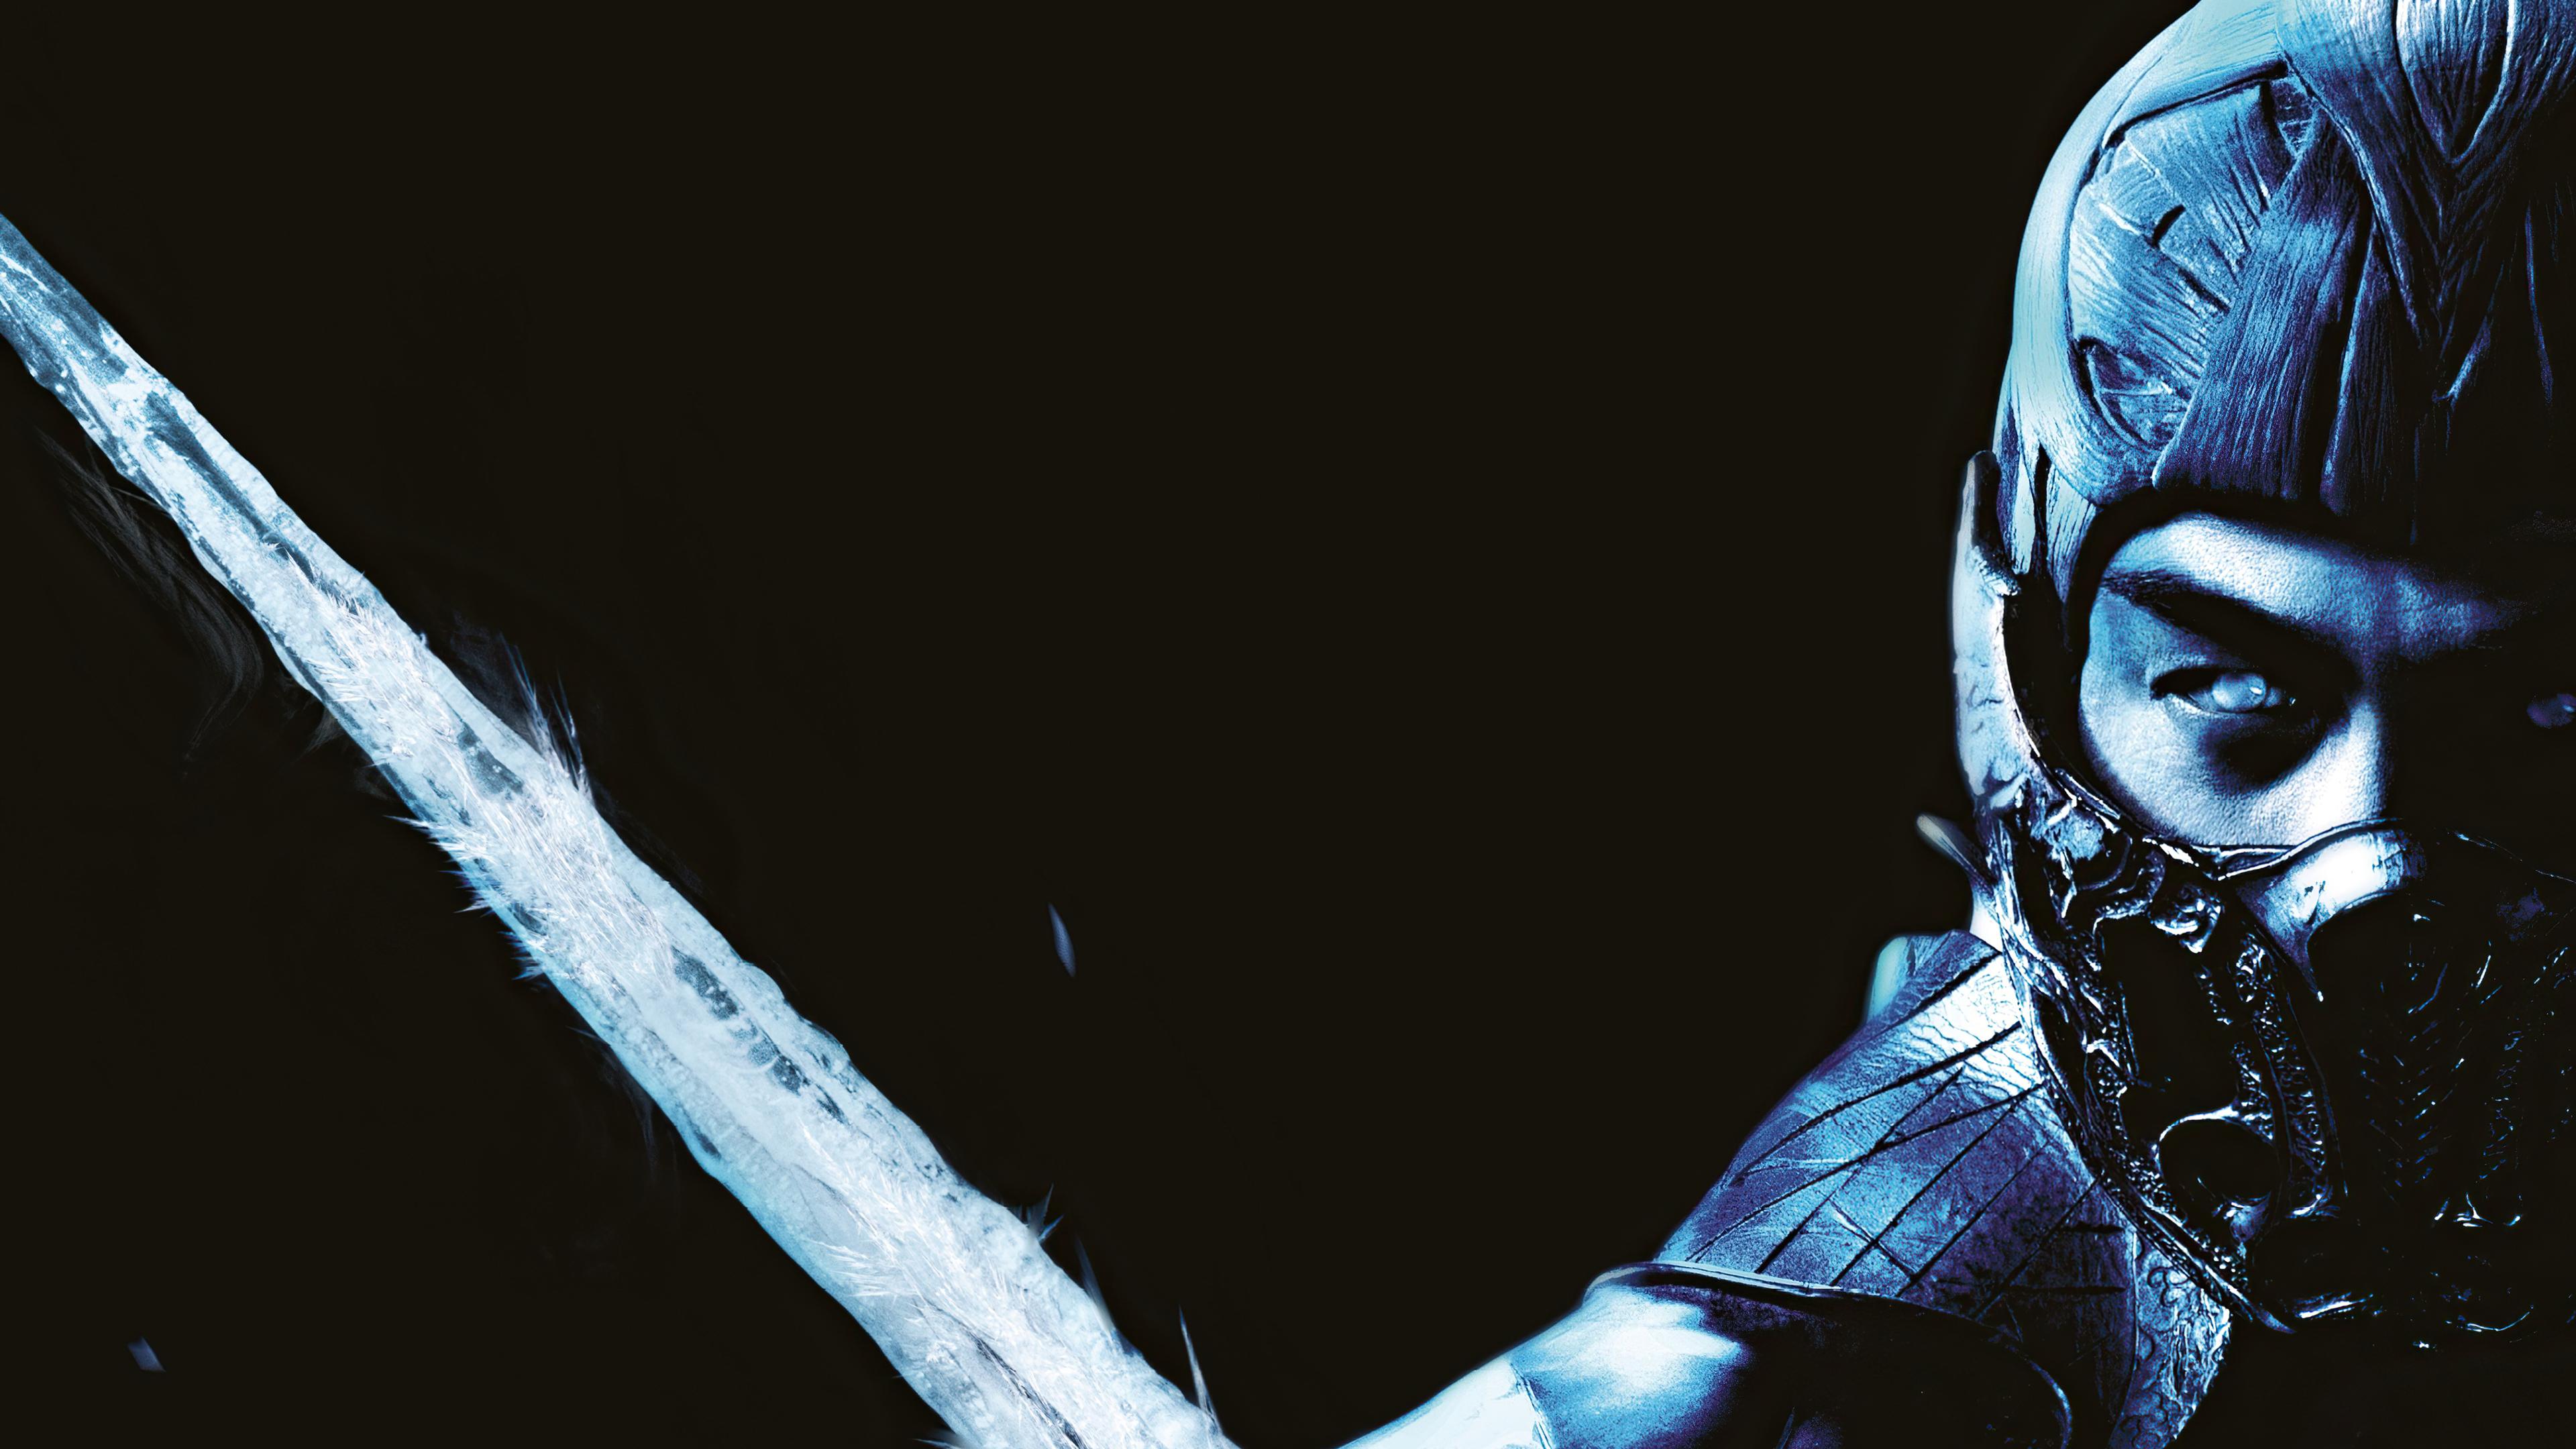 joe taslim as sub zero mortal kombat character poster 4k 1617449355 - Joe Taslim As Sub Zero Mortal Kombat Character Poster 4k - Joe Taslim As Sub Zero Mortal Kombat Character Poster 4k wallpapers